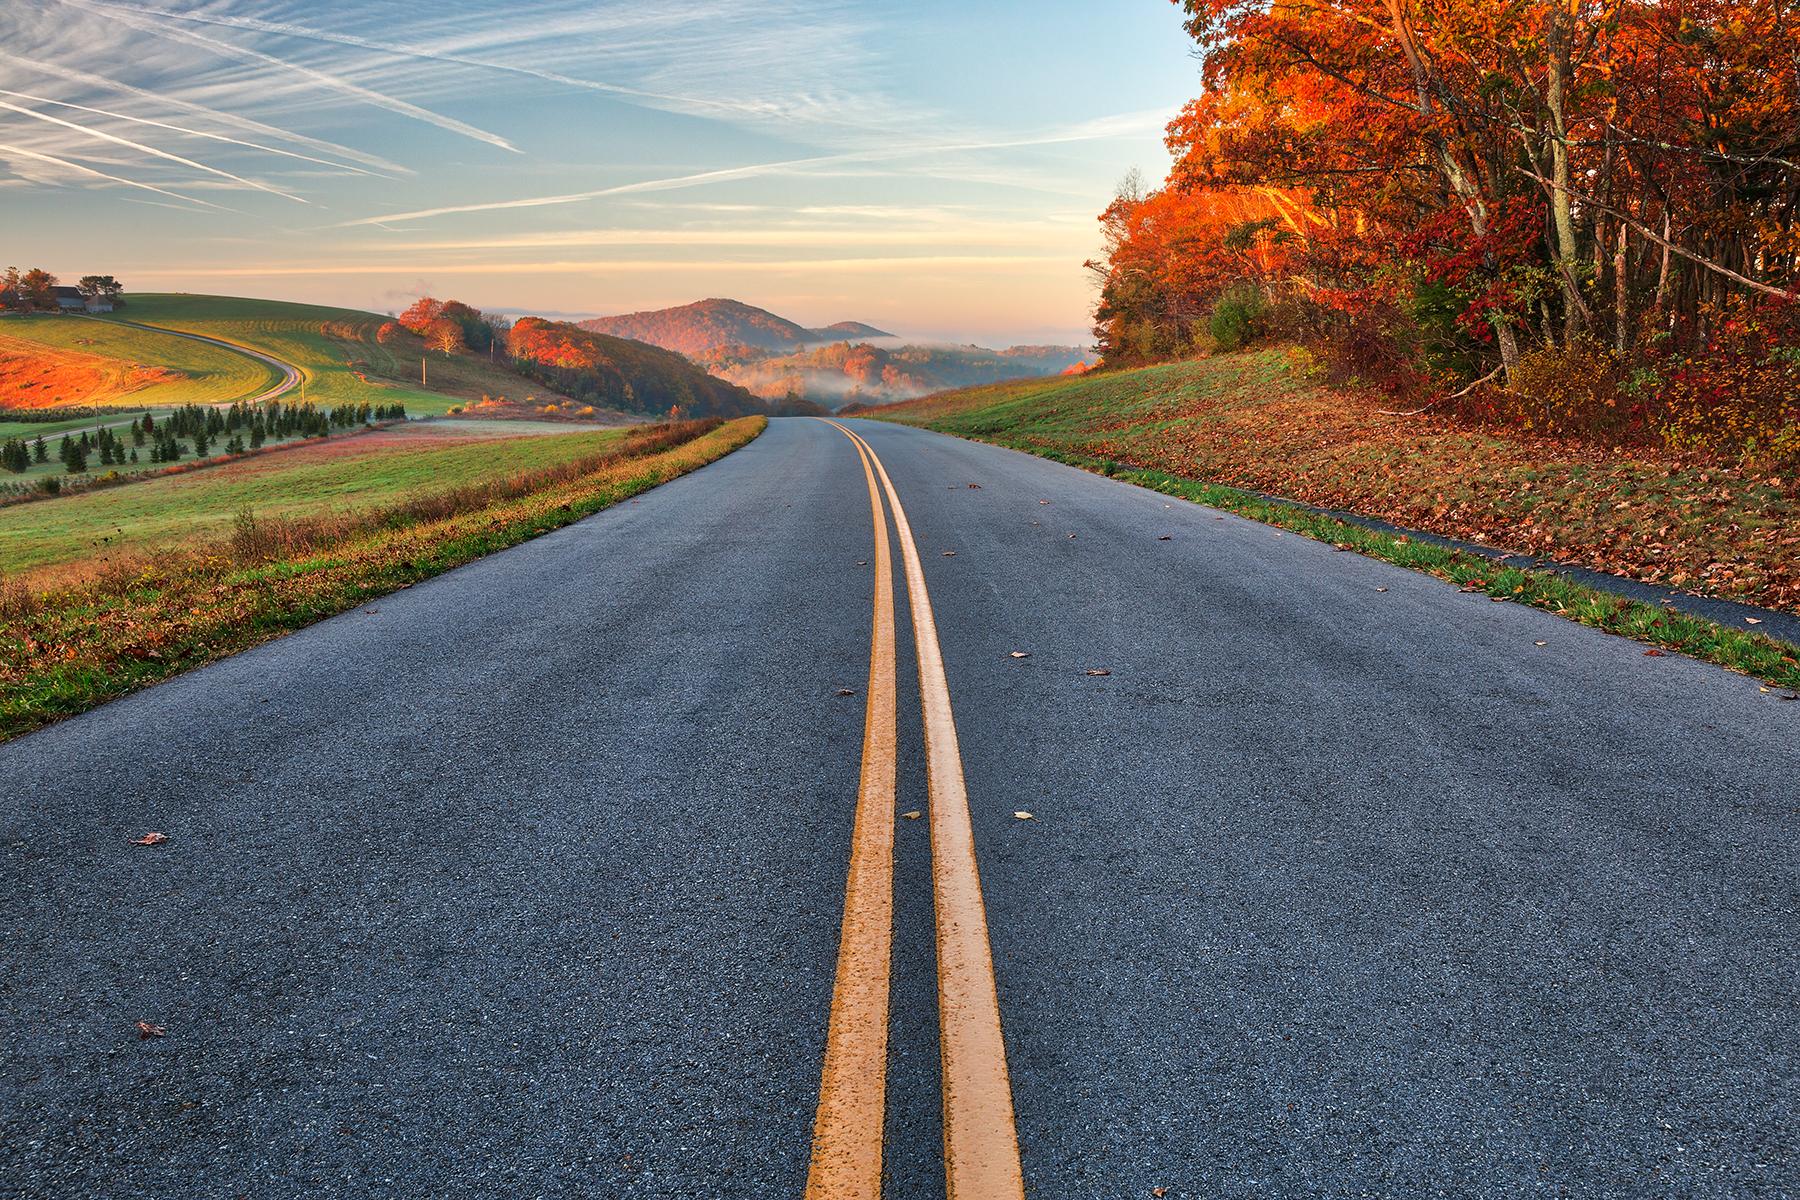 Blue ridge autumn parkway - hdr photo